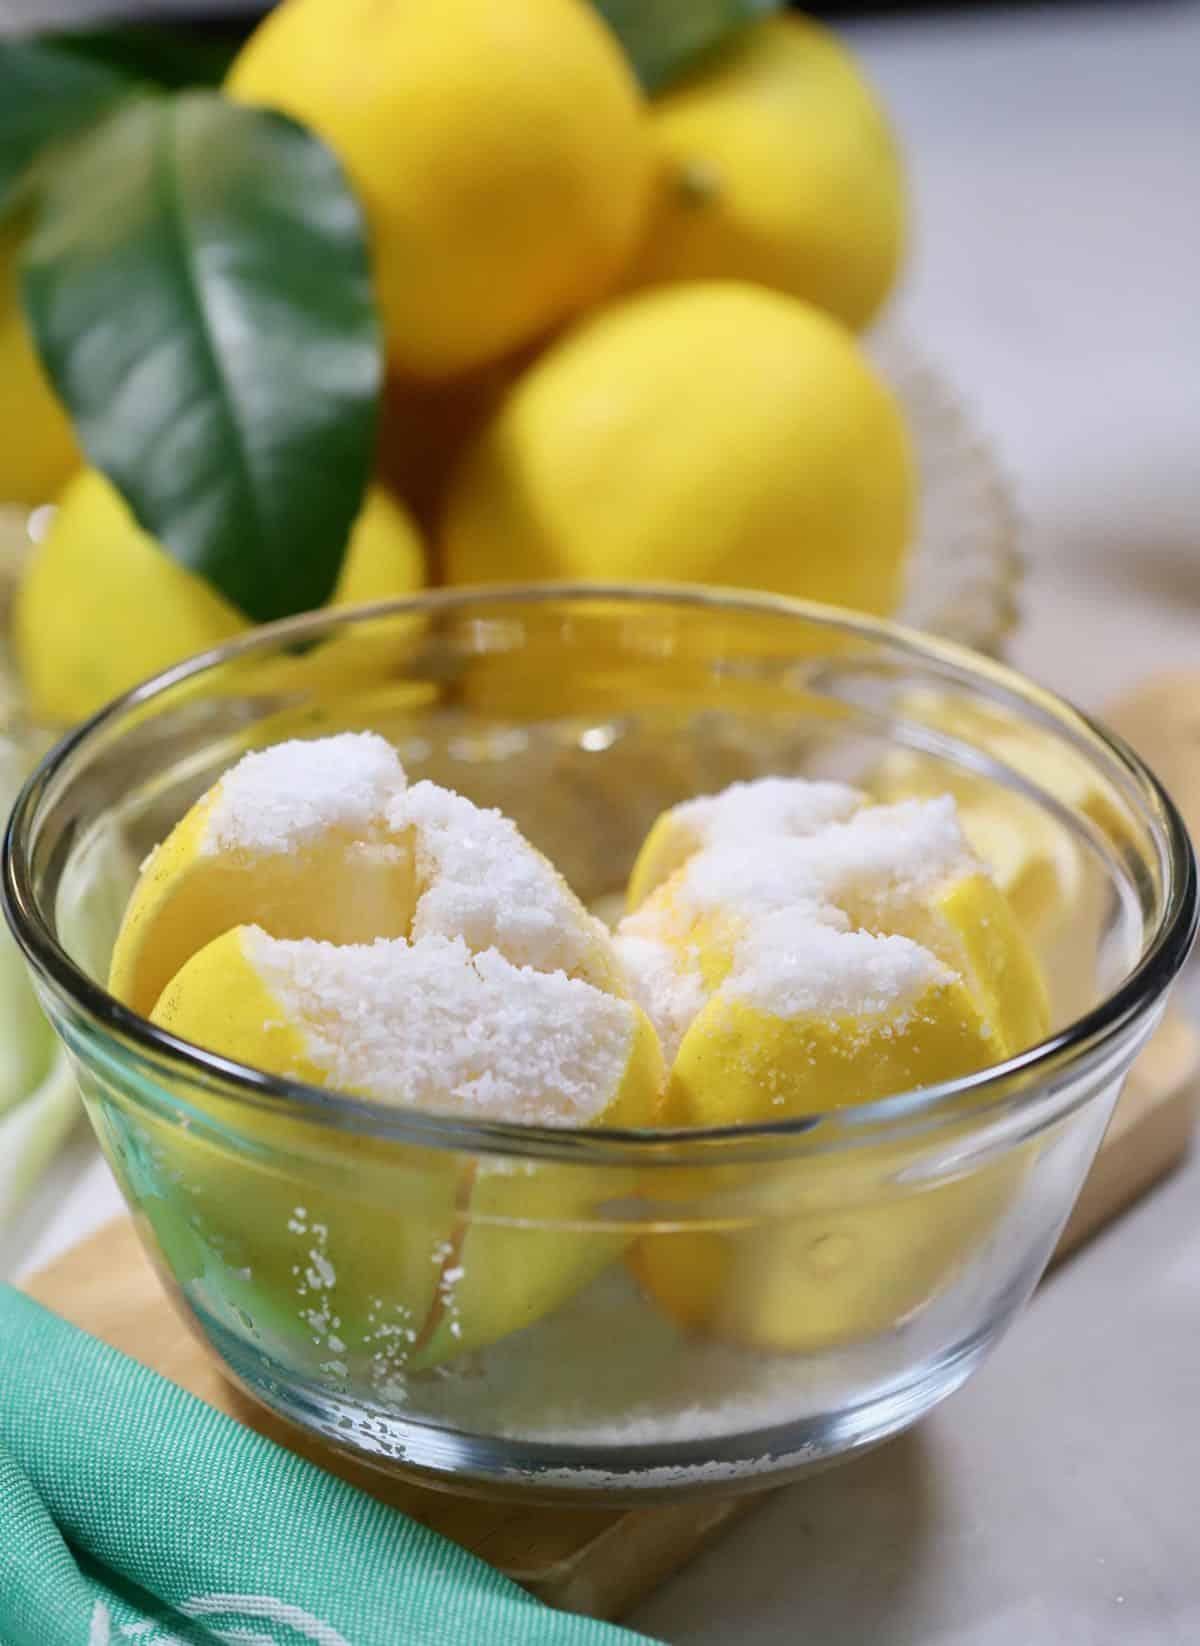 A bowl of lemons with salt on them.